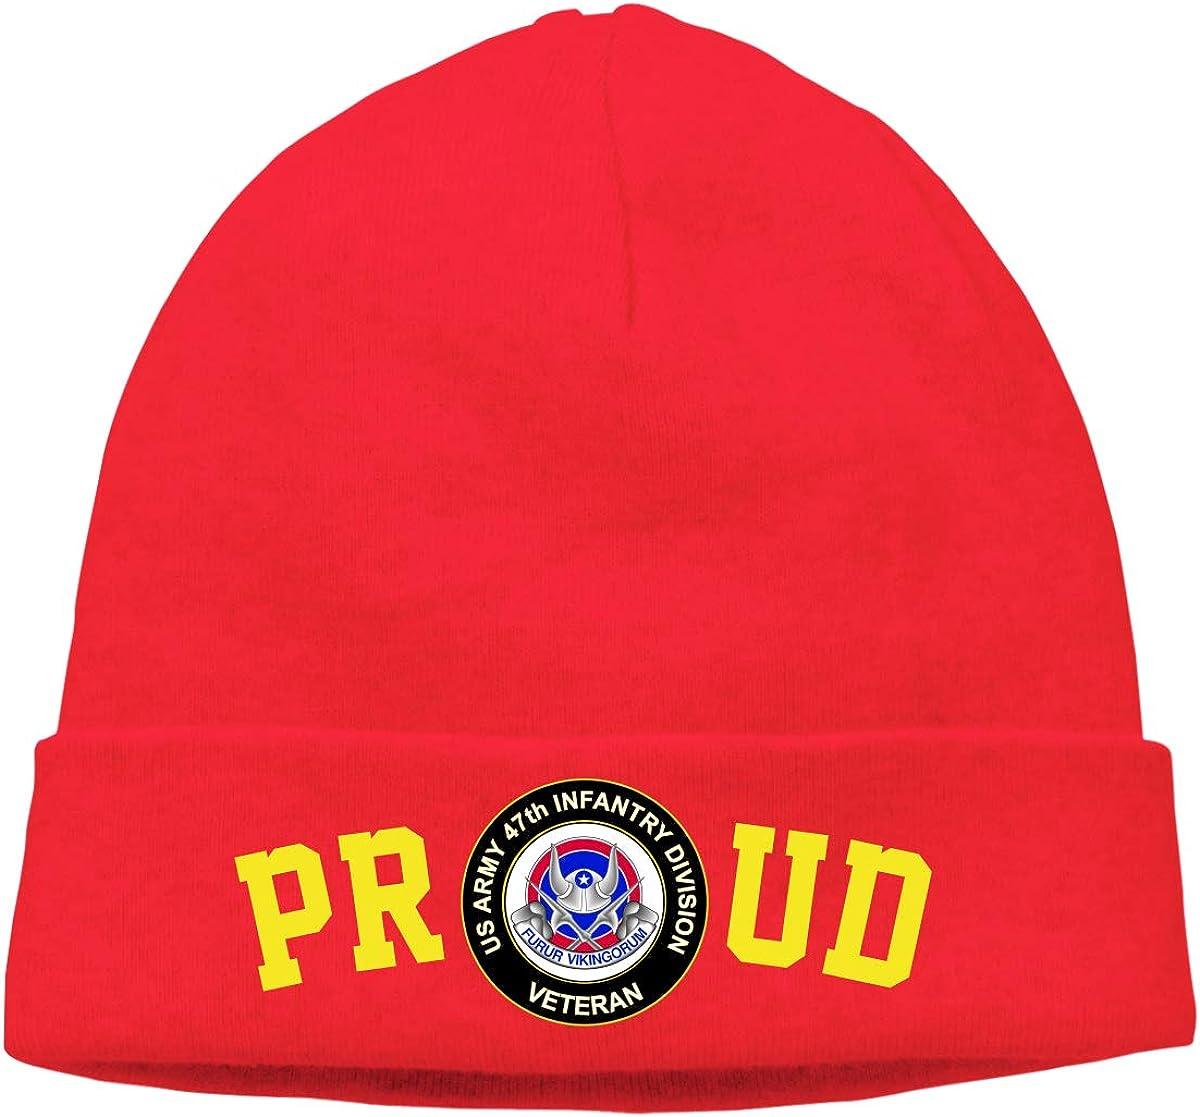 Proud US Army 47th Infantry Unit Crest Veteran Mens Beanie Cap Skull Cap Winter Warm Knitting Hats.